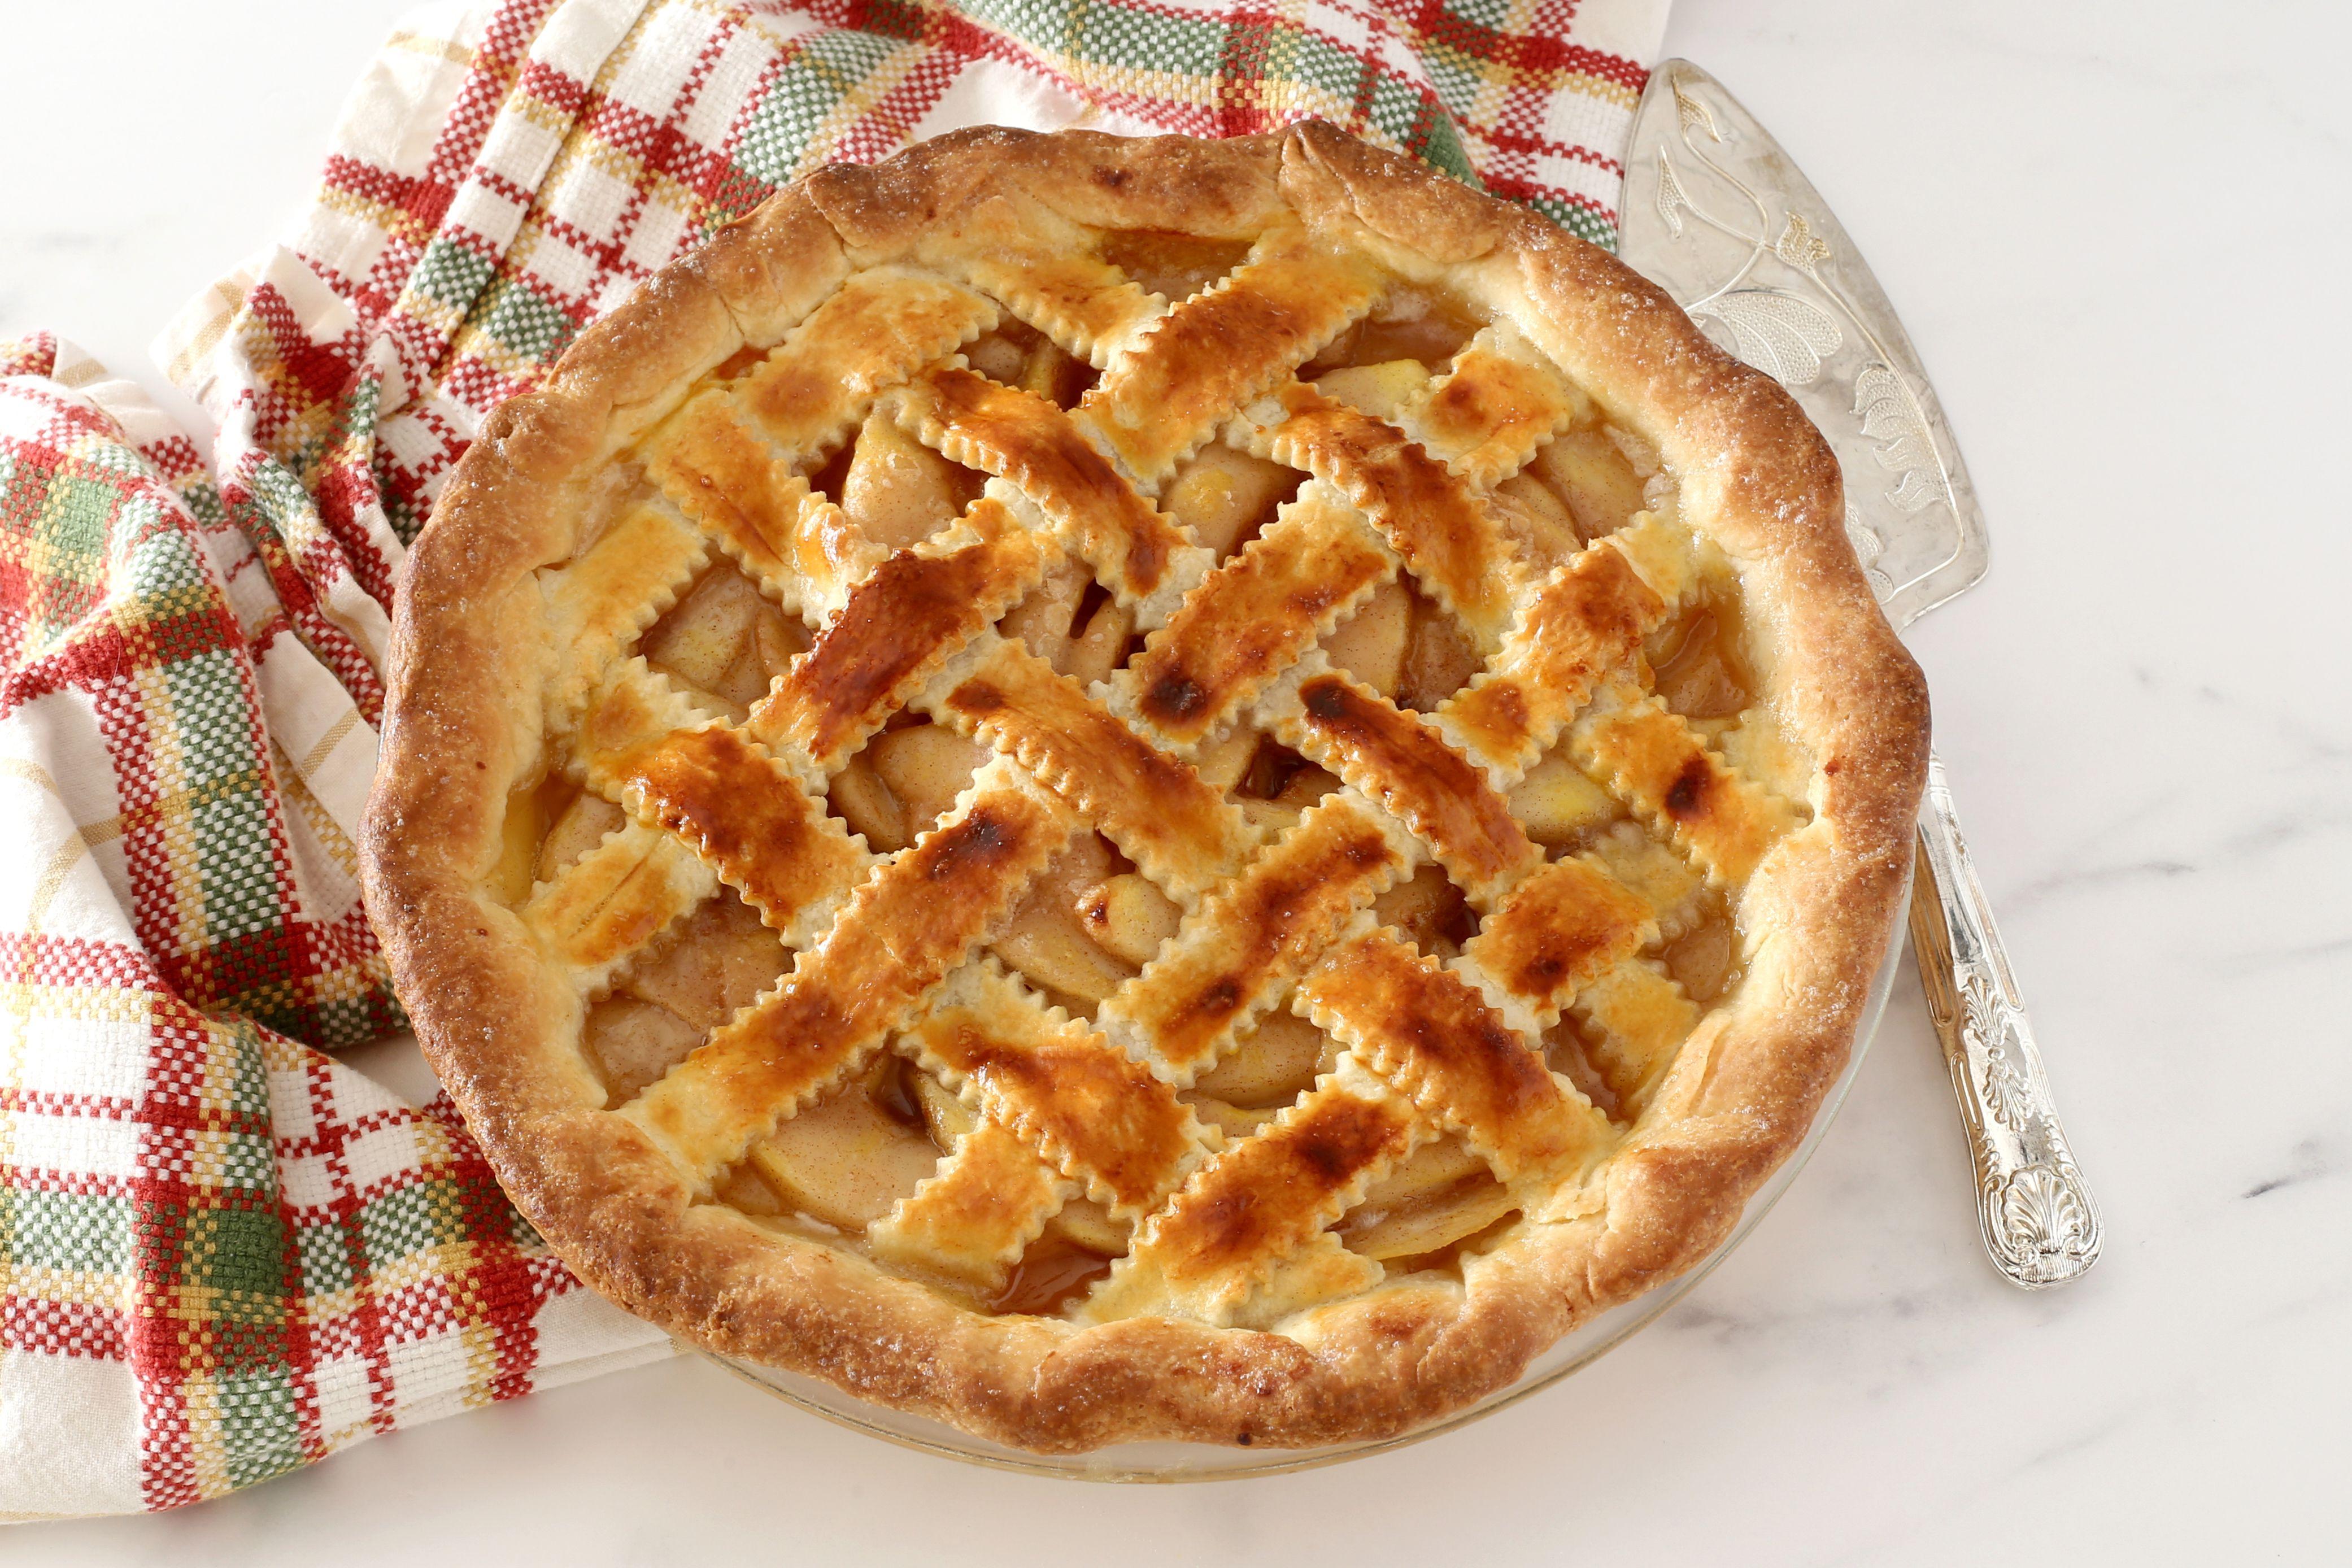 Pear pie with lattice top crust.